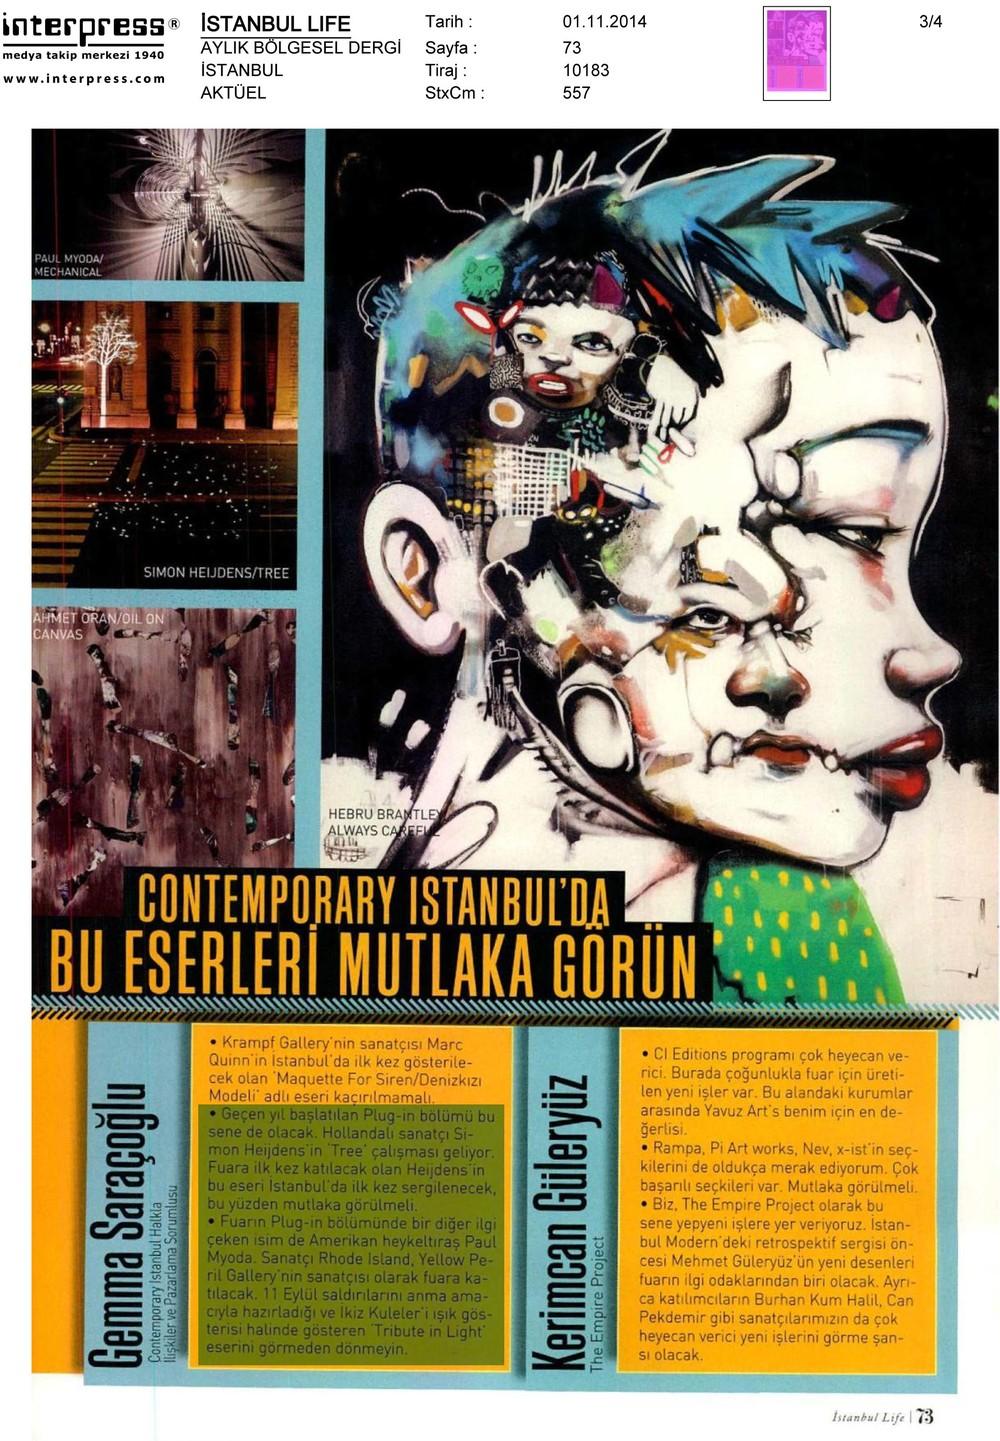 Istanbuk Life - Aylık Bölgesel Dergi 03-11-2.jpg